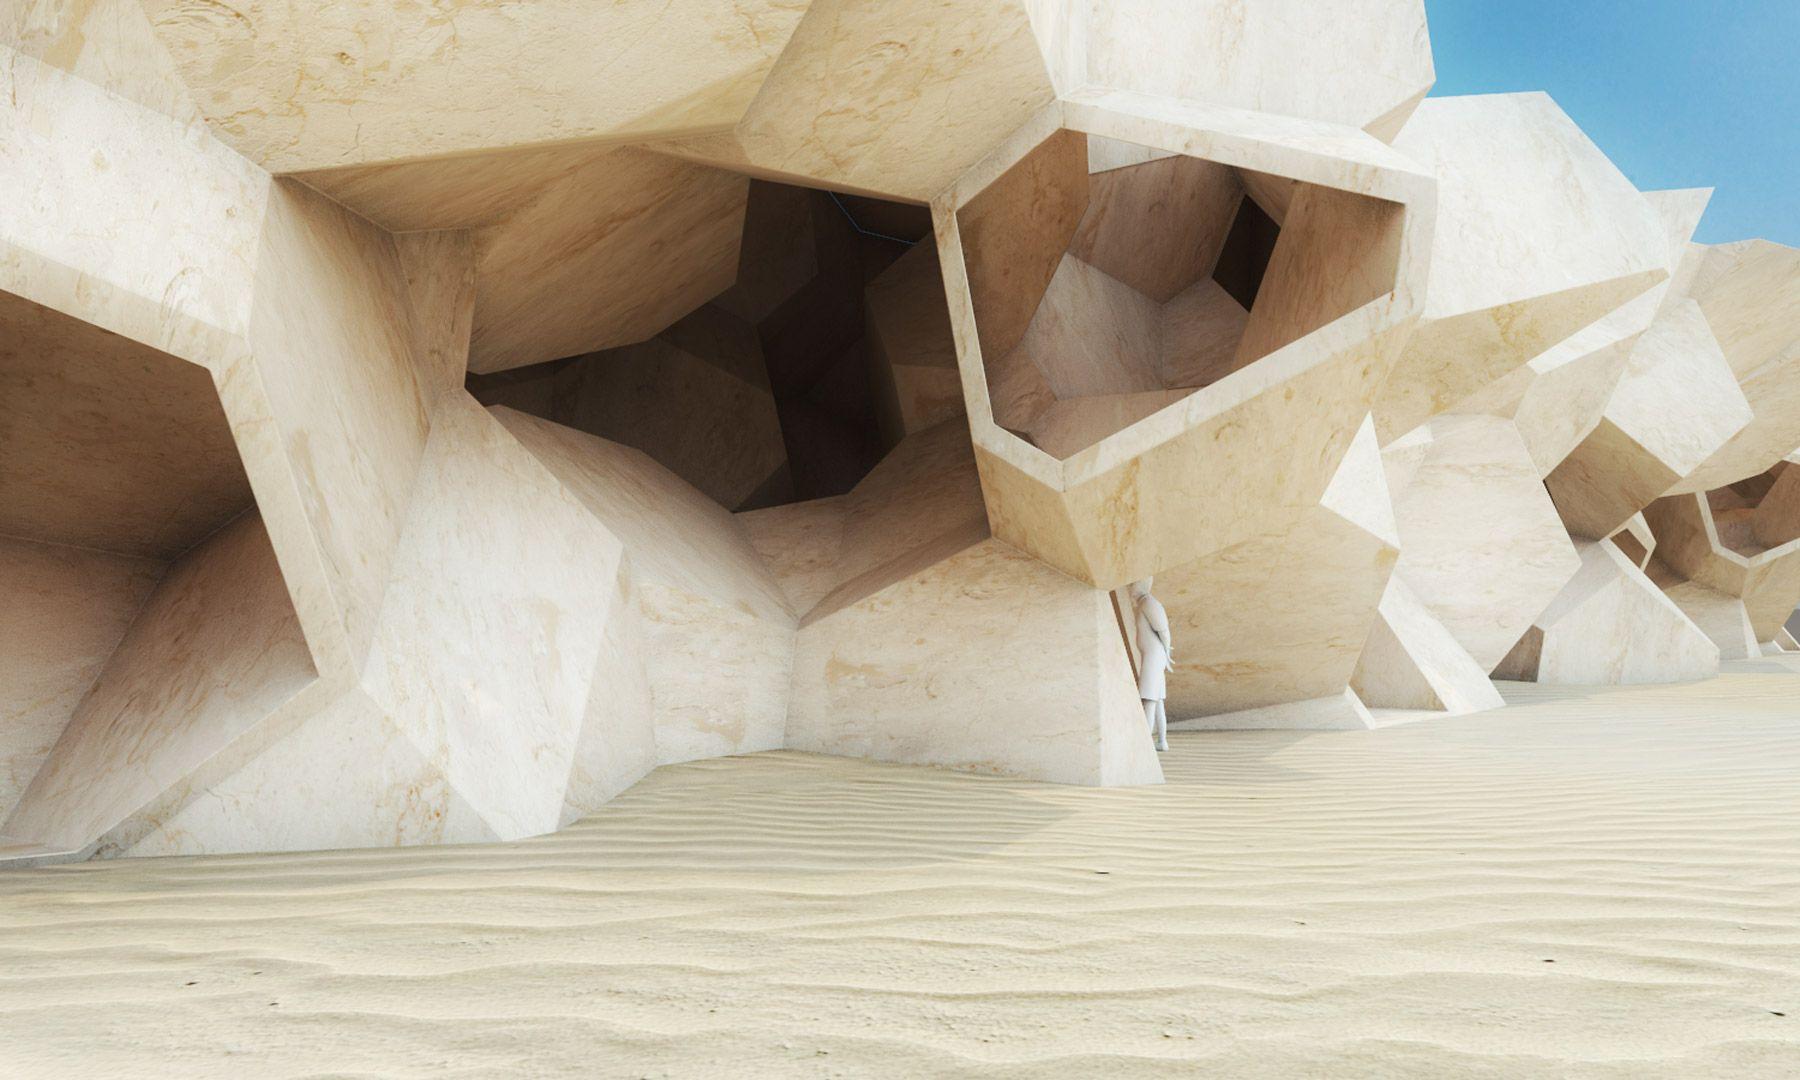 Ordinary Exhibition | Dune Architecture v4.0